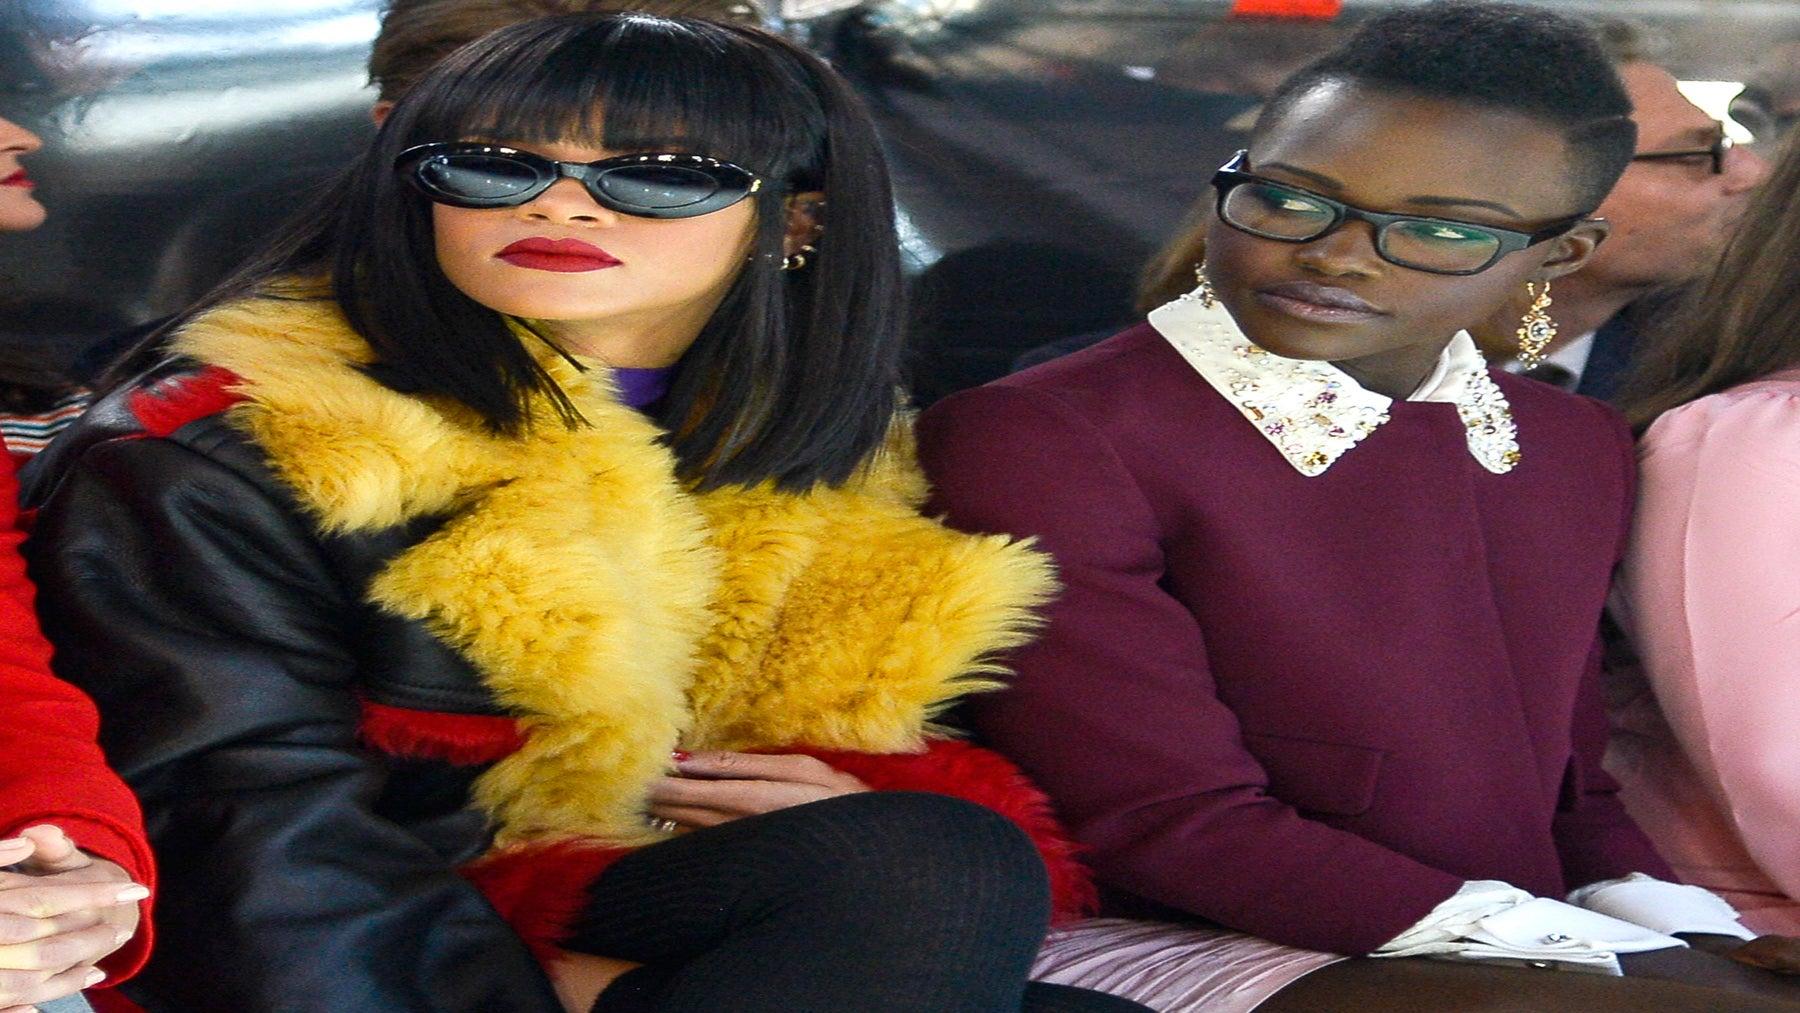 Ava DuVernay On Rihanna And Lupita Nyong'o Film Happening: 'We Deserve Nice Things'